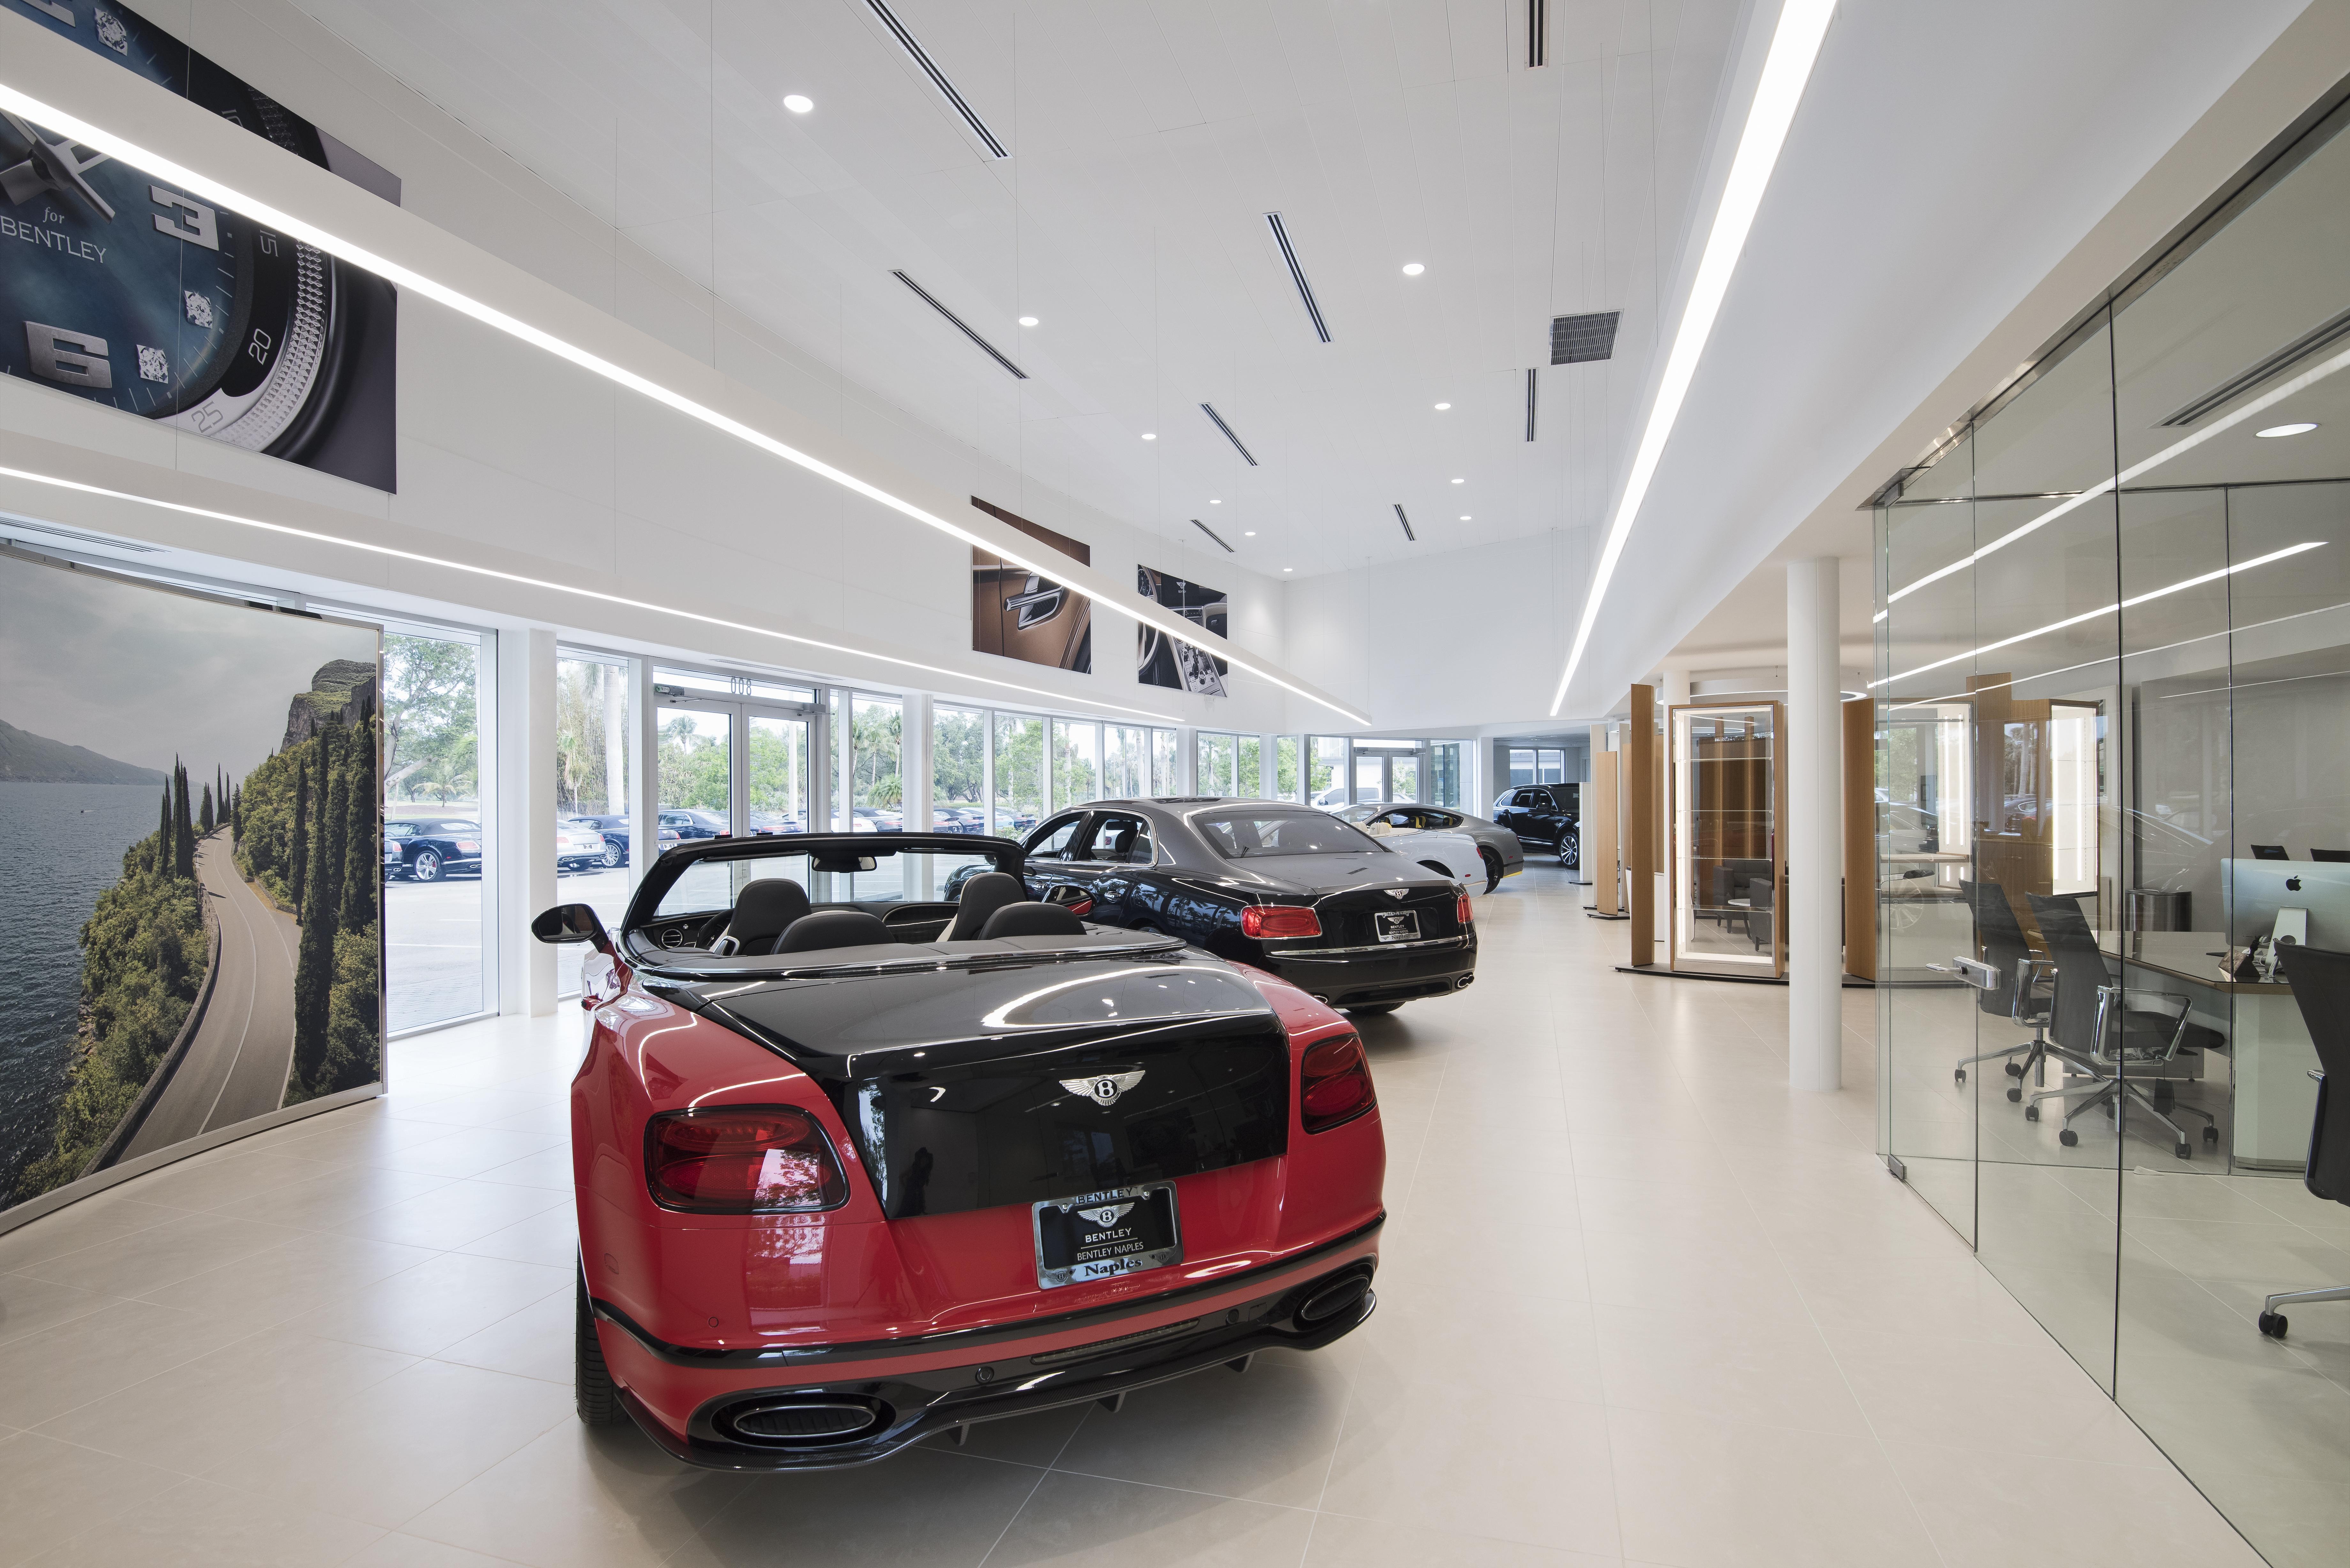 Bentley Dealership Naples FL Waltbillig Hood General Contractors - Car show naples fl today